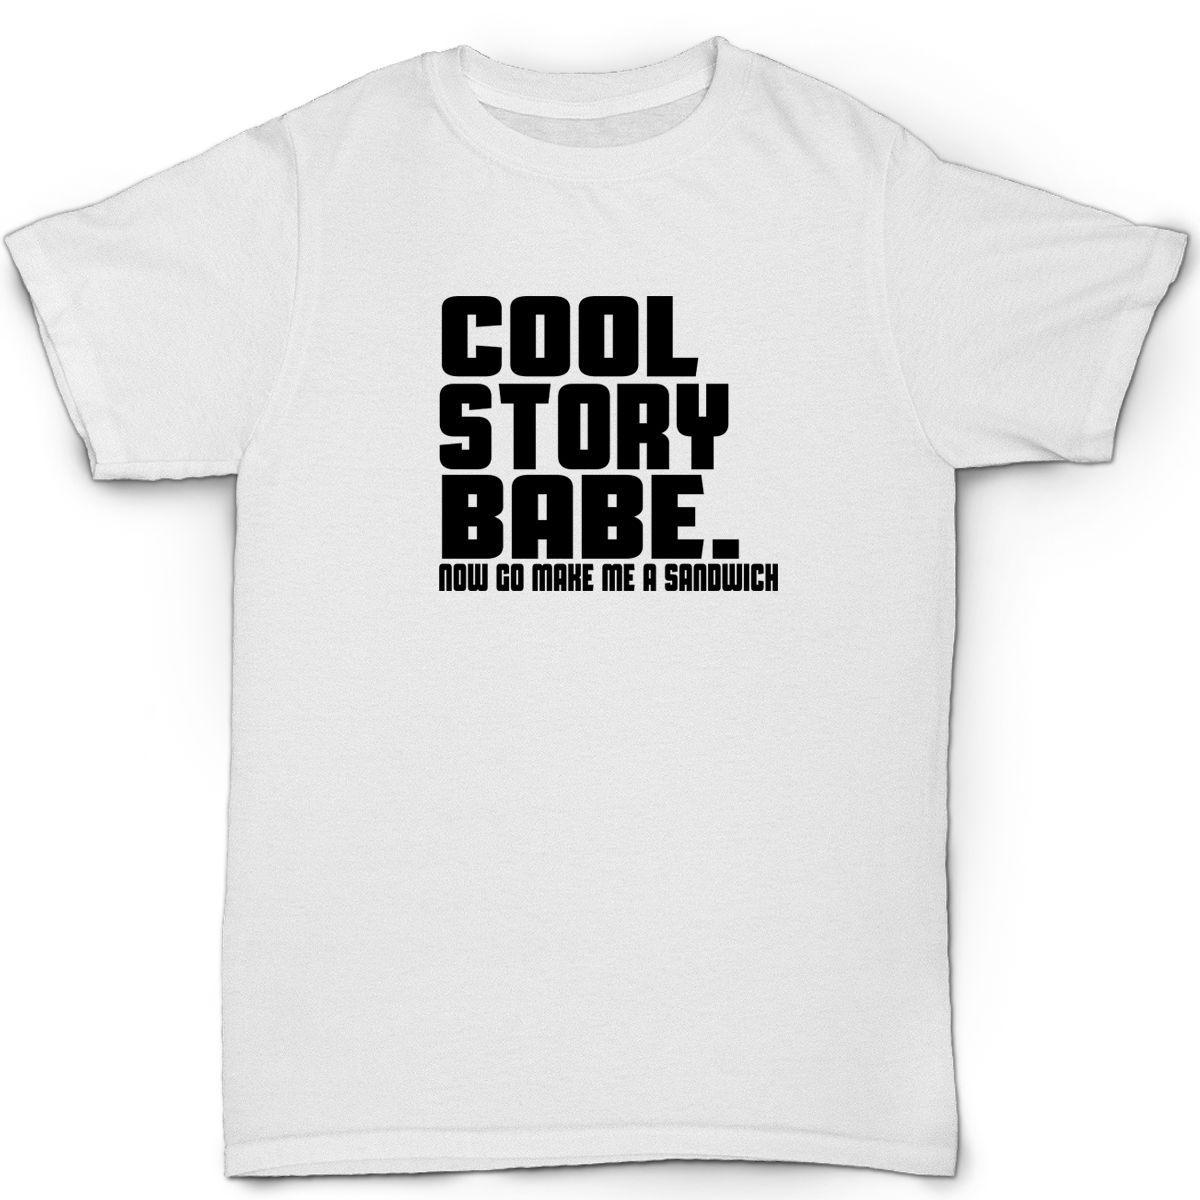 cool story babe mens t shirt funny humour birthday gift Print T Shirt Mens Short Sleeve Hot Tops Tshirt Homme